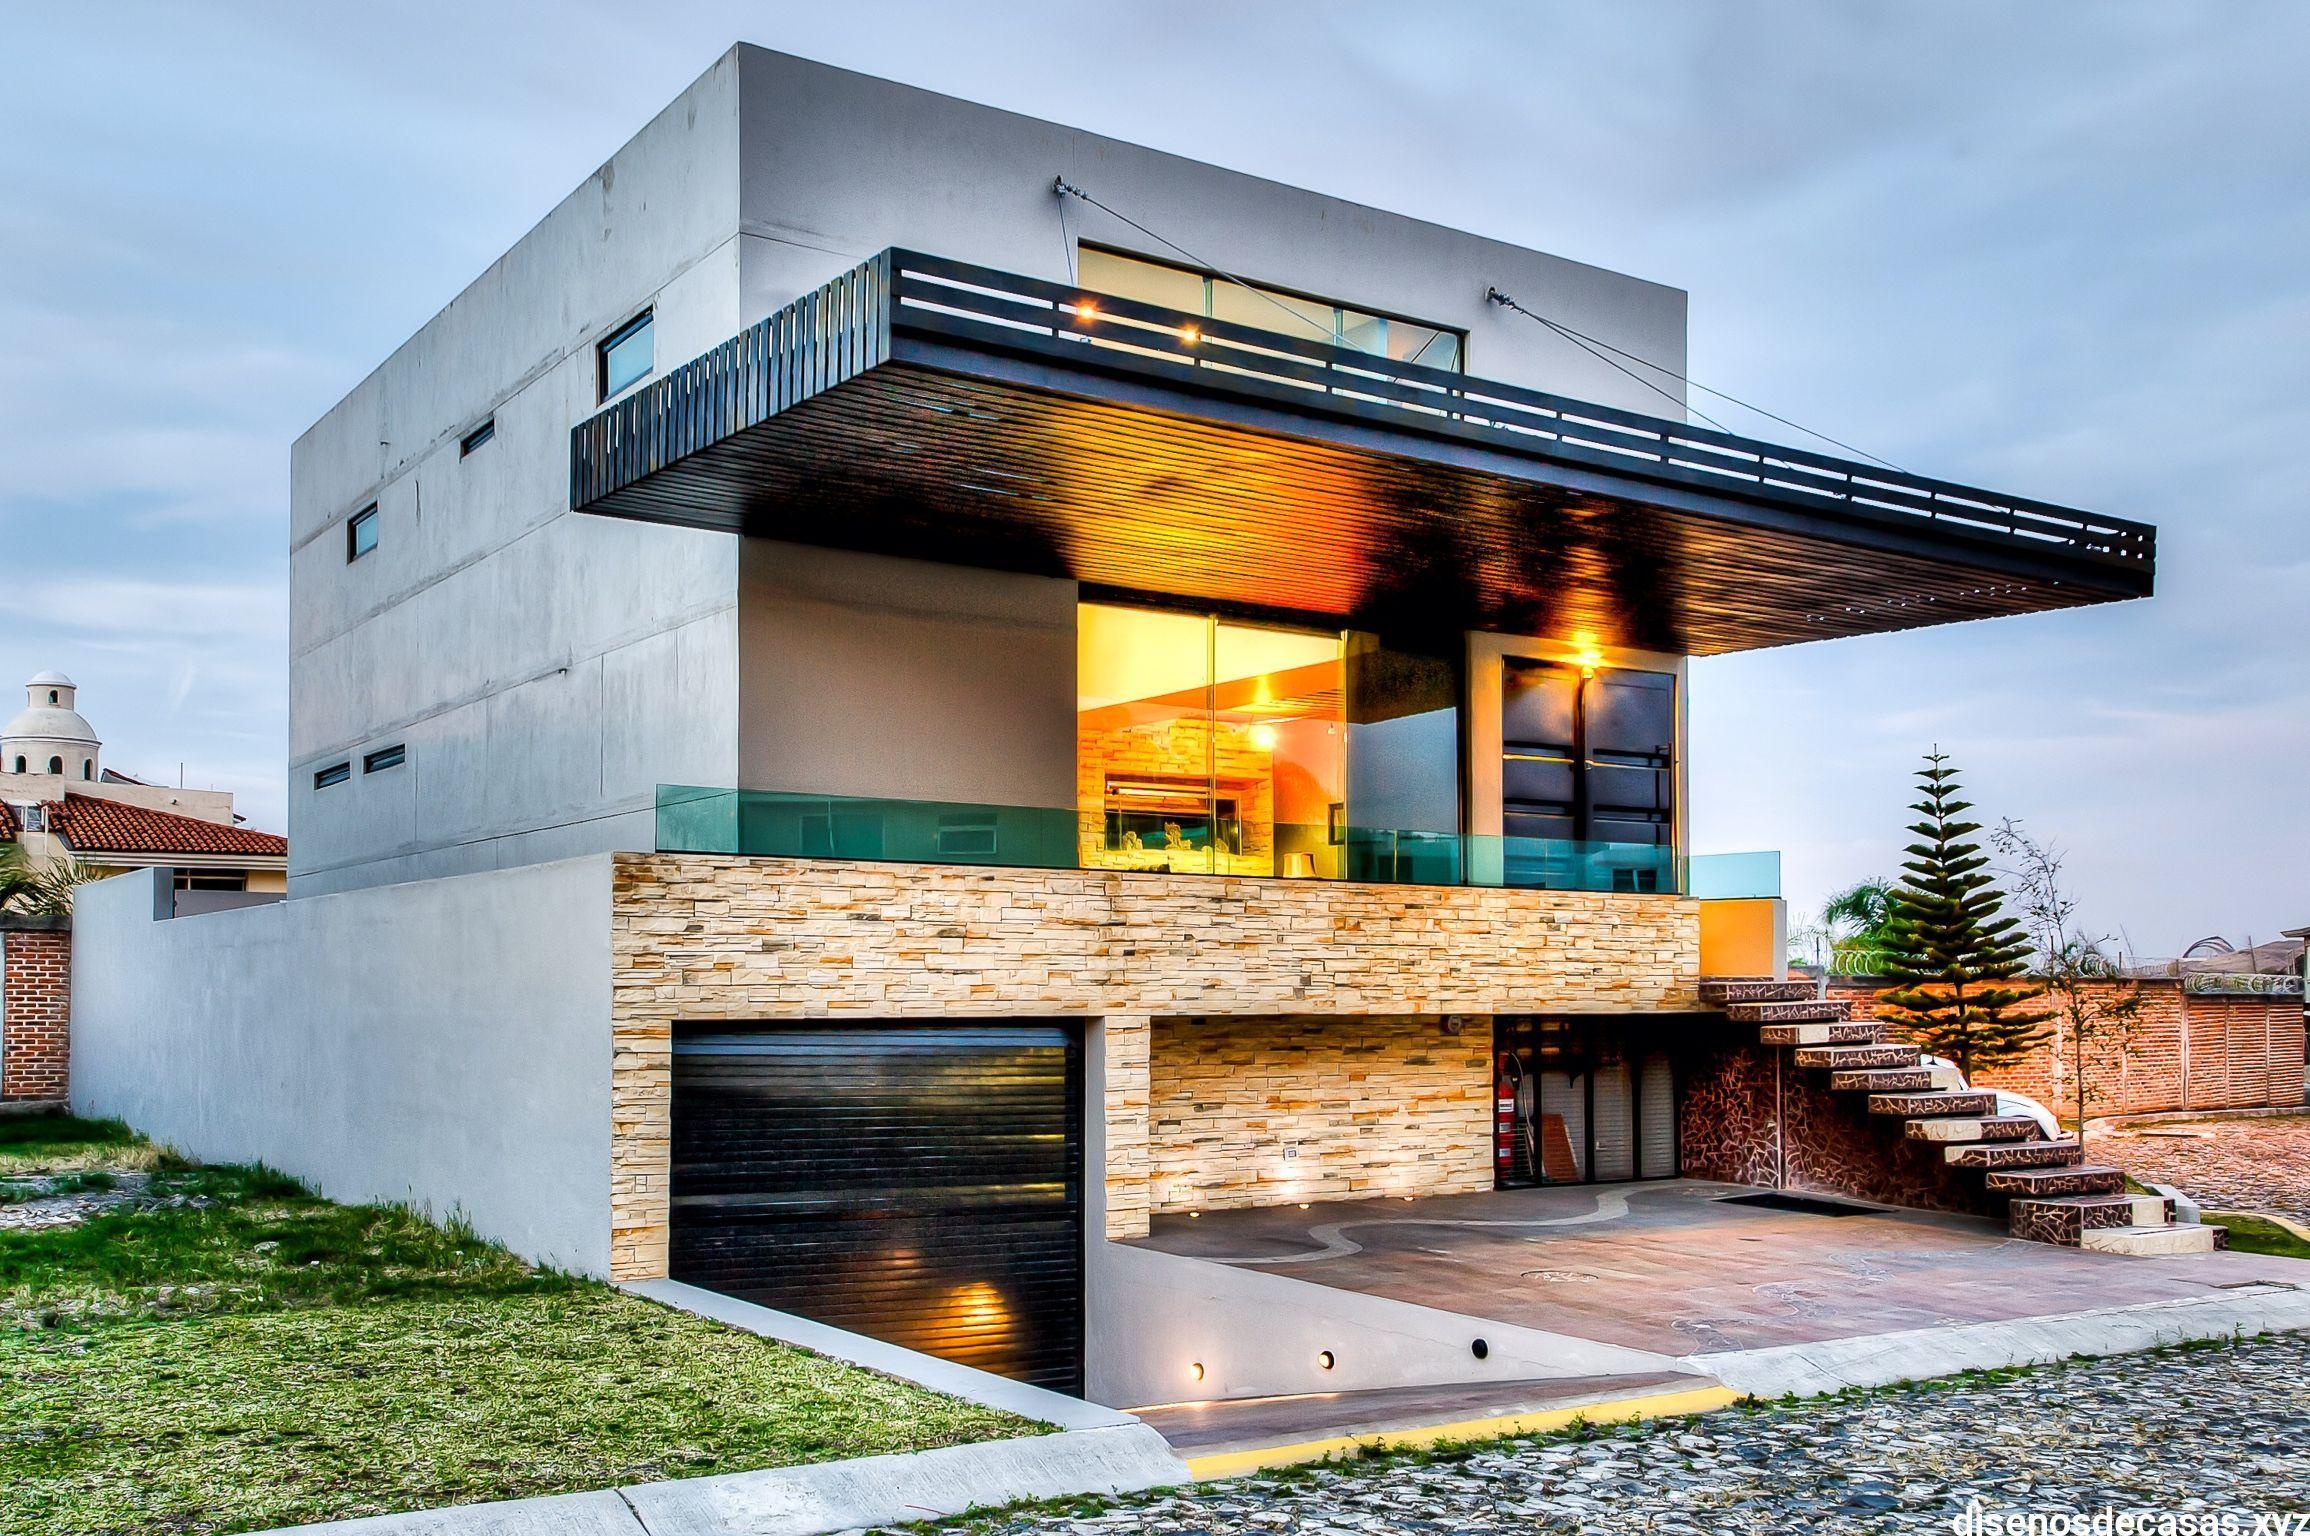 Casa con contenedores contenedores pinterest casas - Casa de contenedores ...